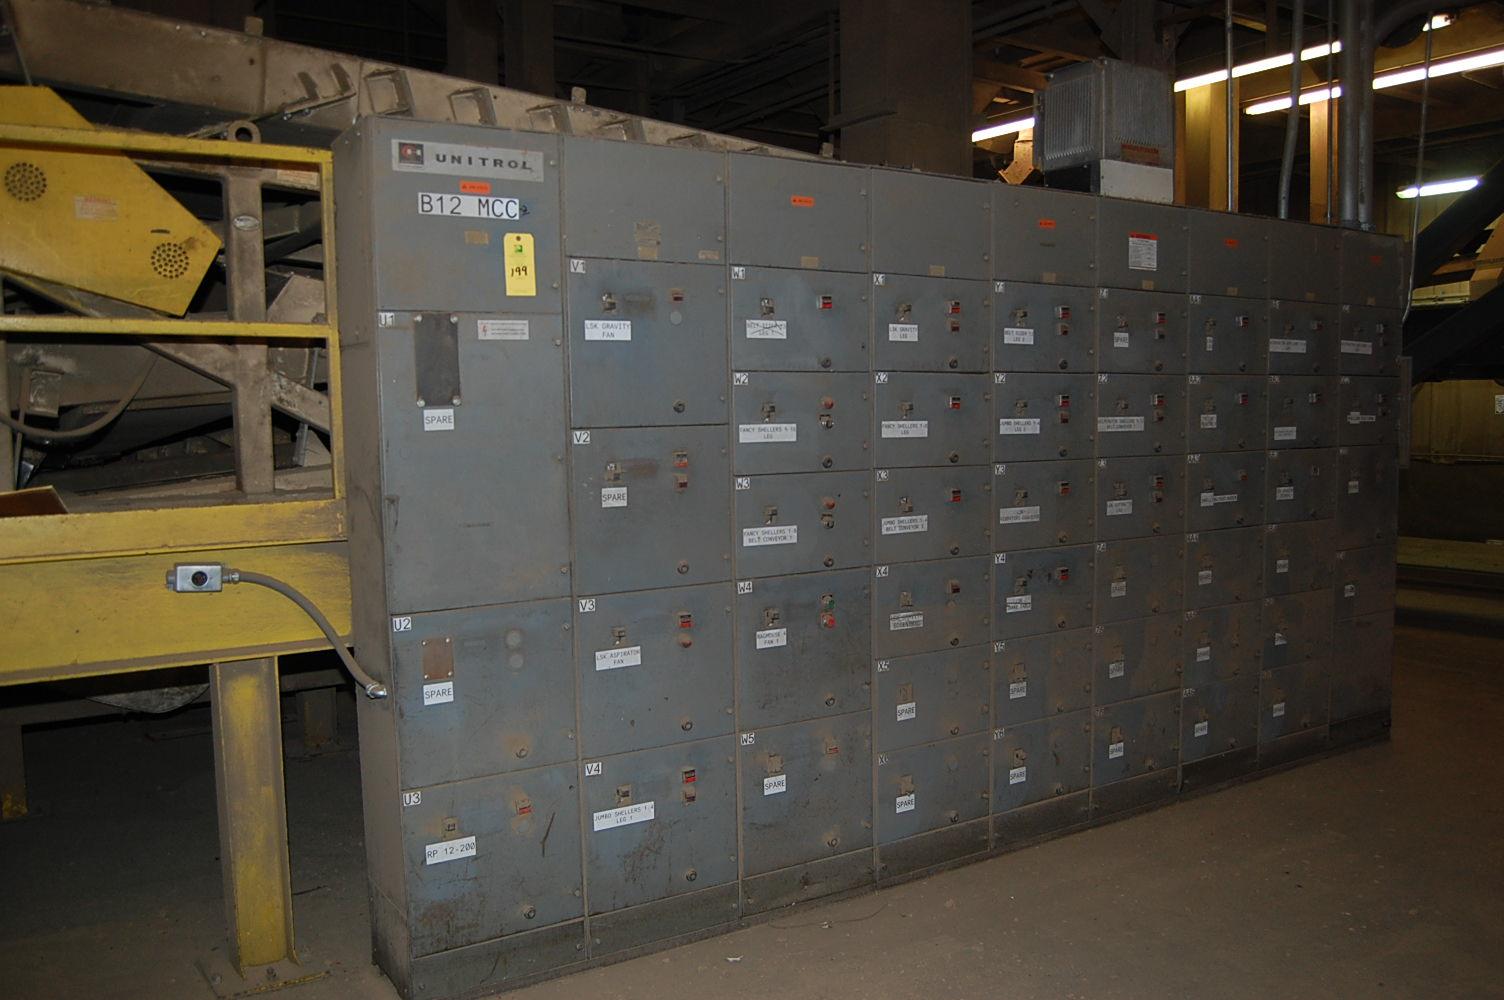 Cutler hammer unitrol motor control center id b12 mcc 2 for Cutler hammer motor control centers